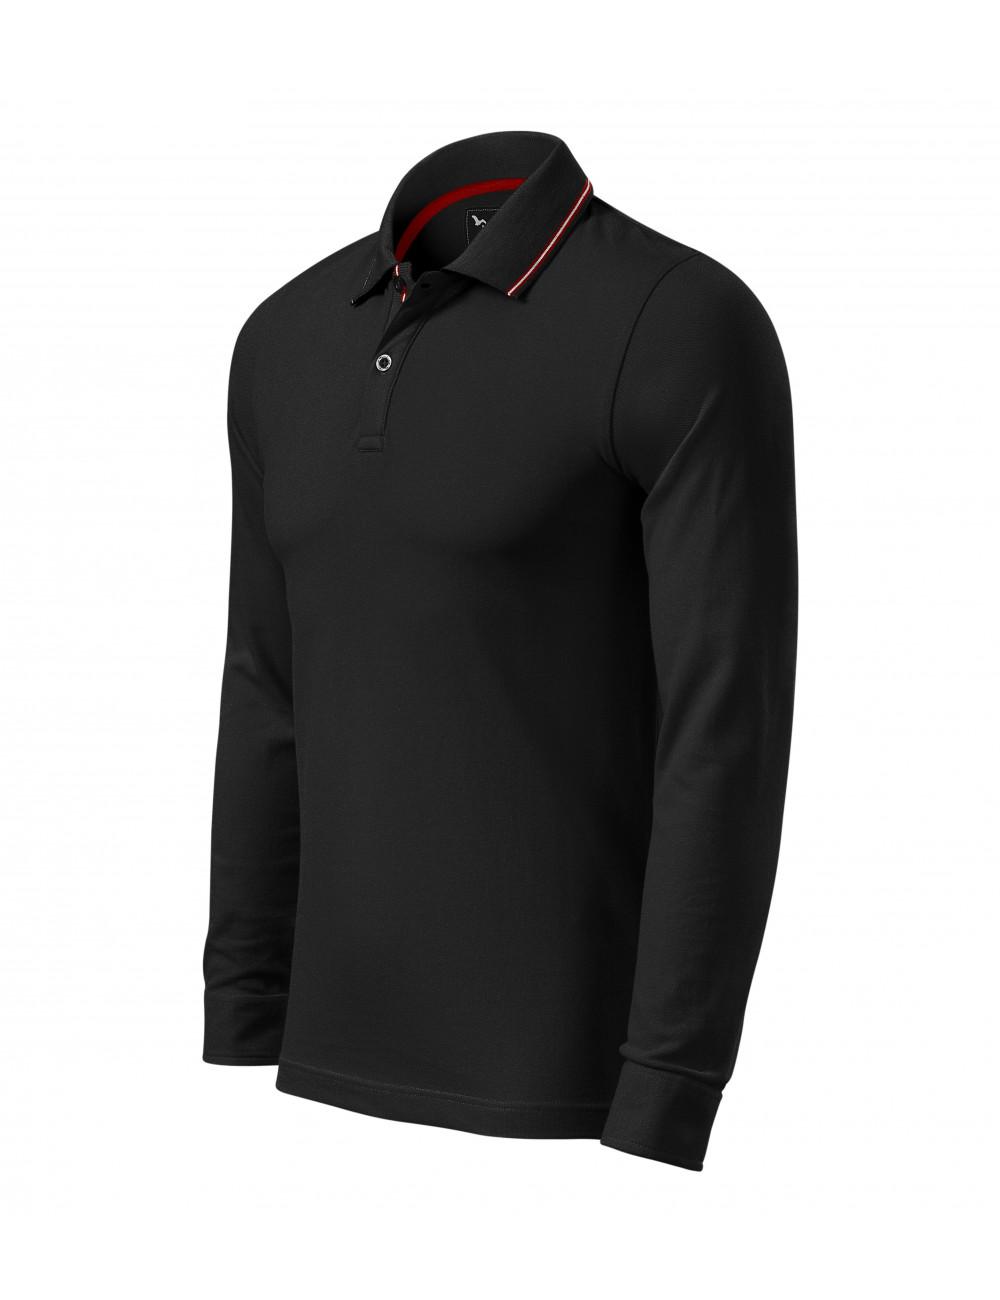 Adler MALFINIPREMIUM Koszulka polo męska Contrast Stripe LS 258 czarny